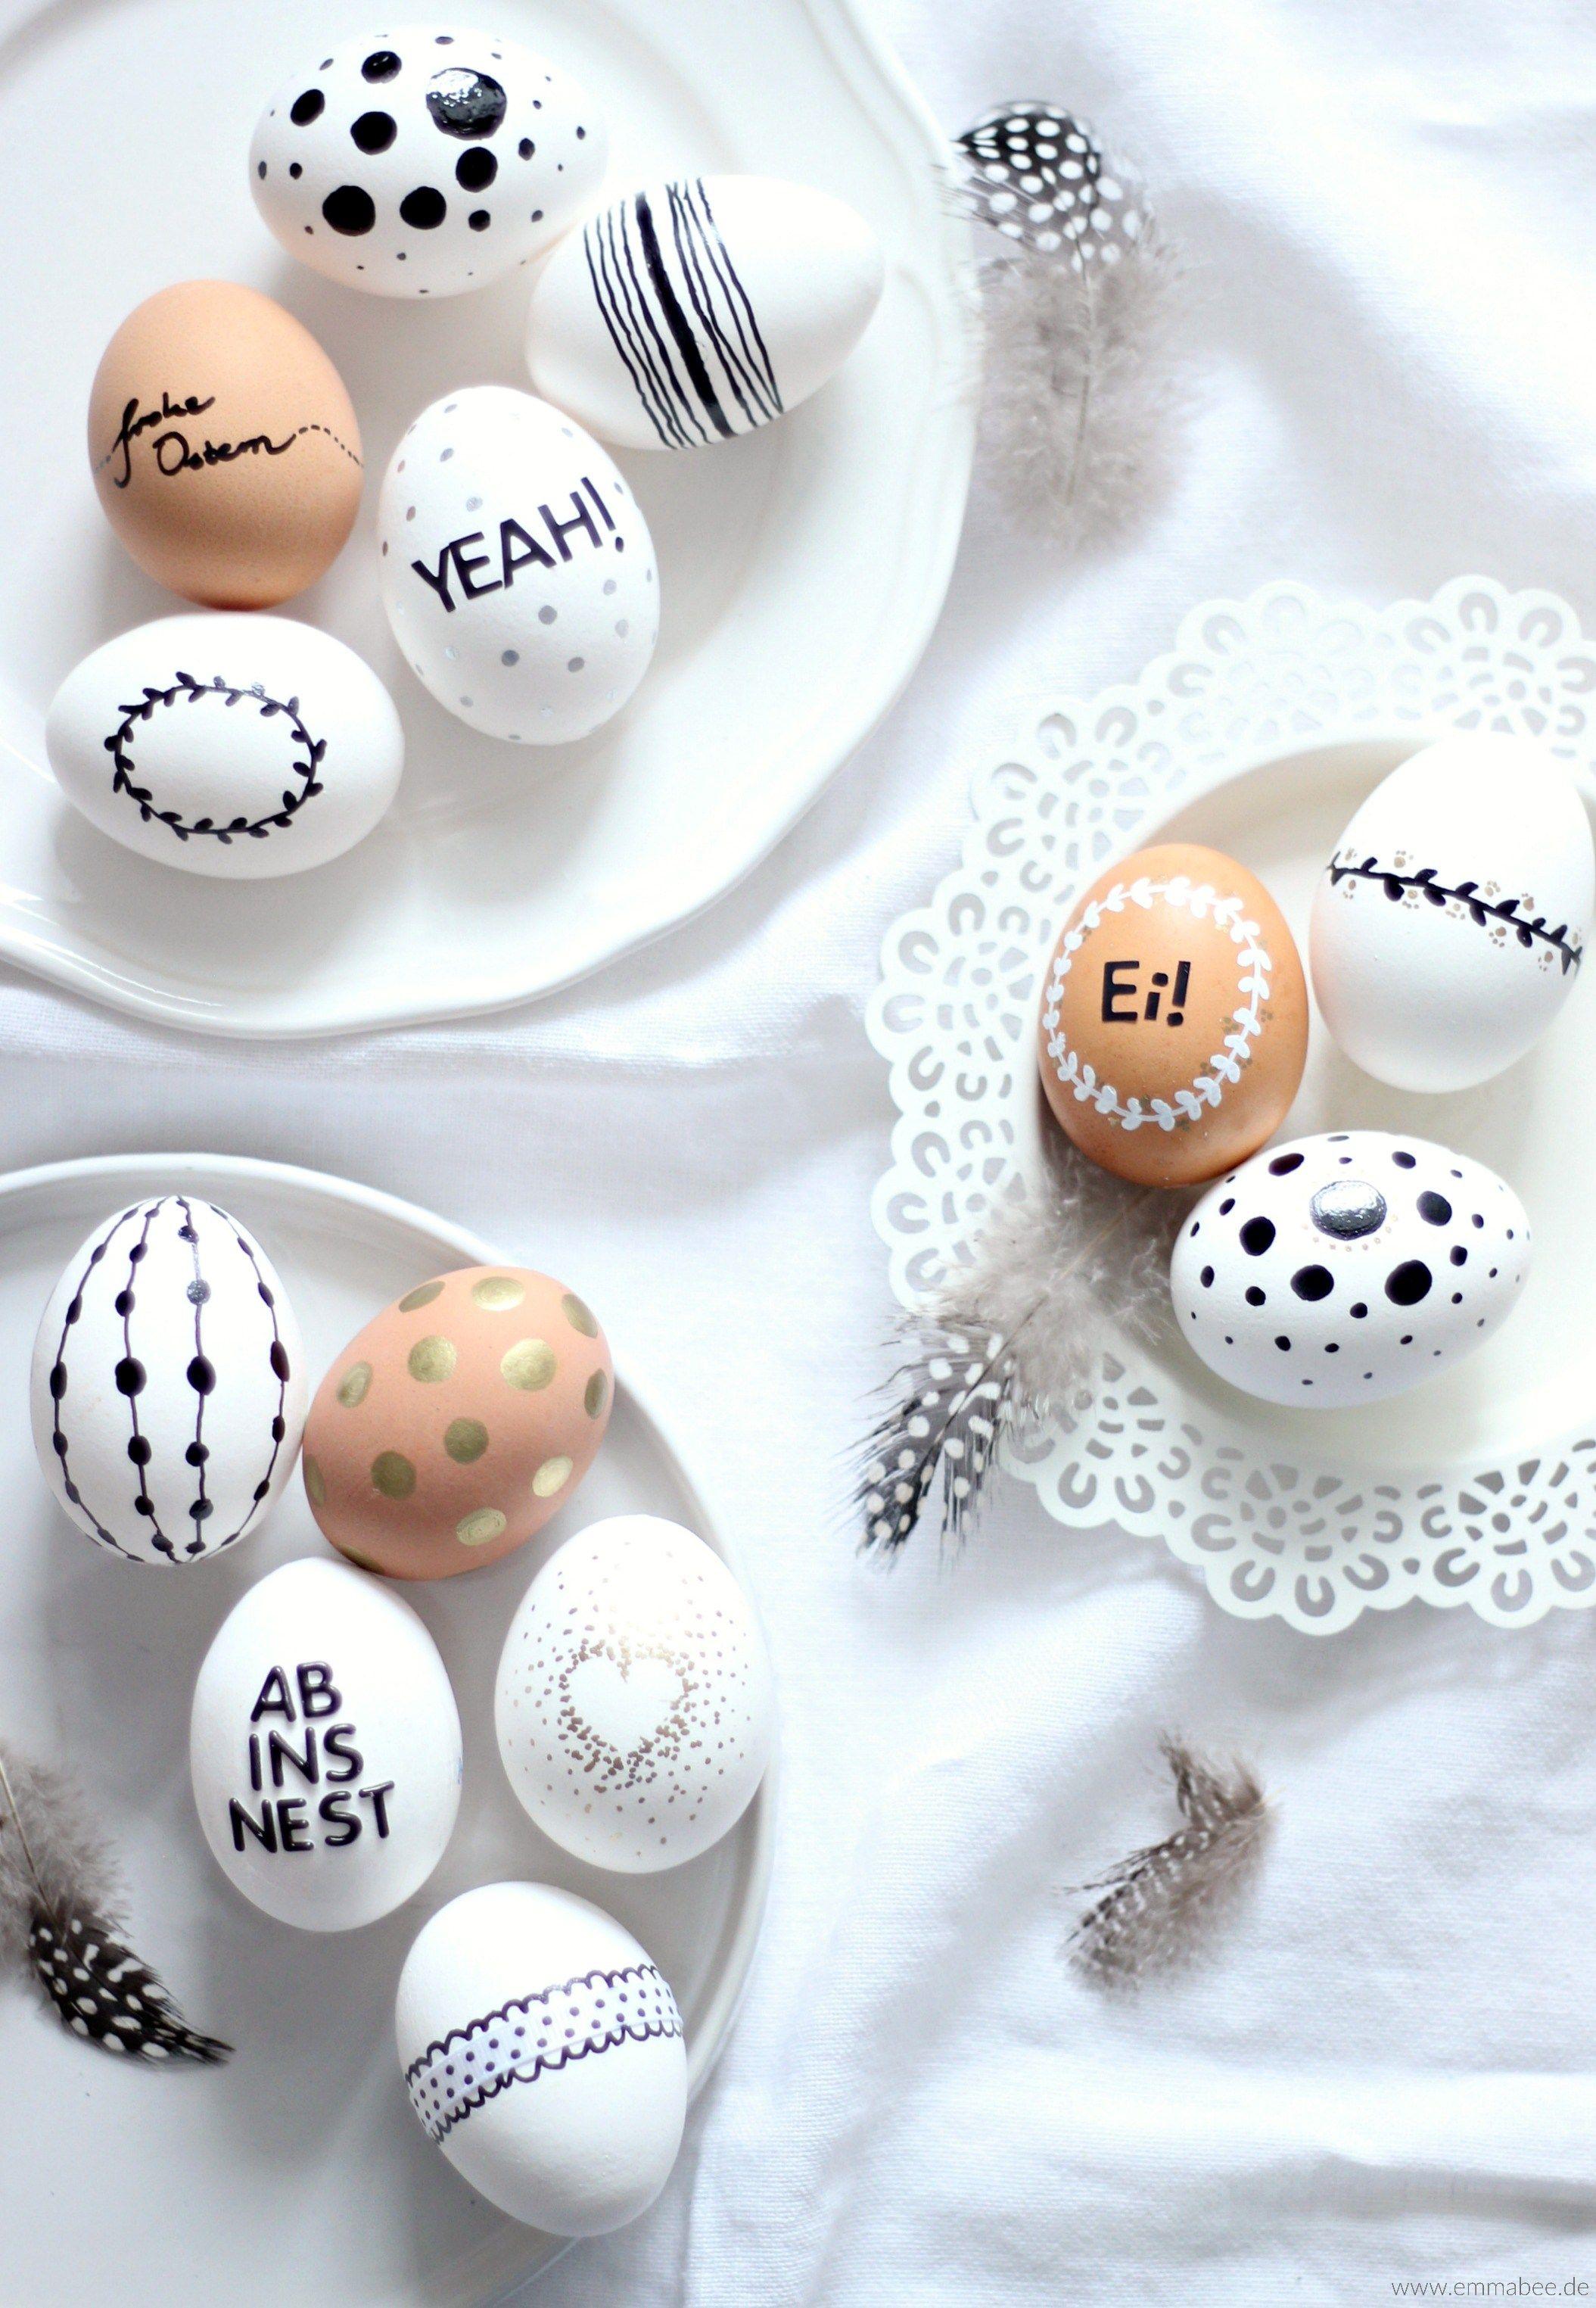 diy ostereier bemalen oster deko ostern eier ostern und diy ostern. Black Bedroom Furniture Sets. Home Design Ideas